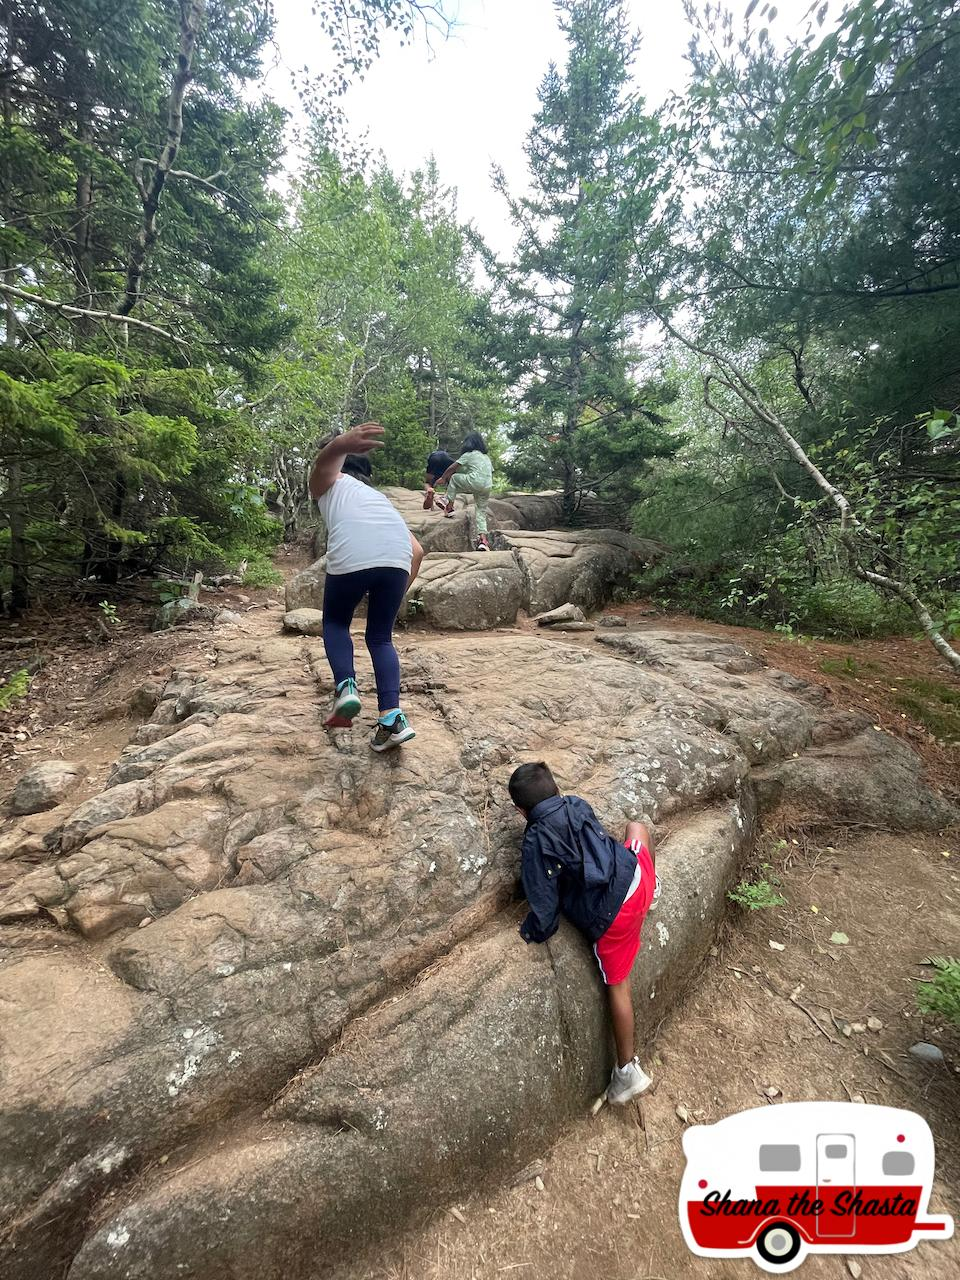 Climbing-Bubbles-in-Acadia